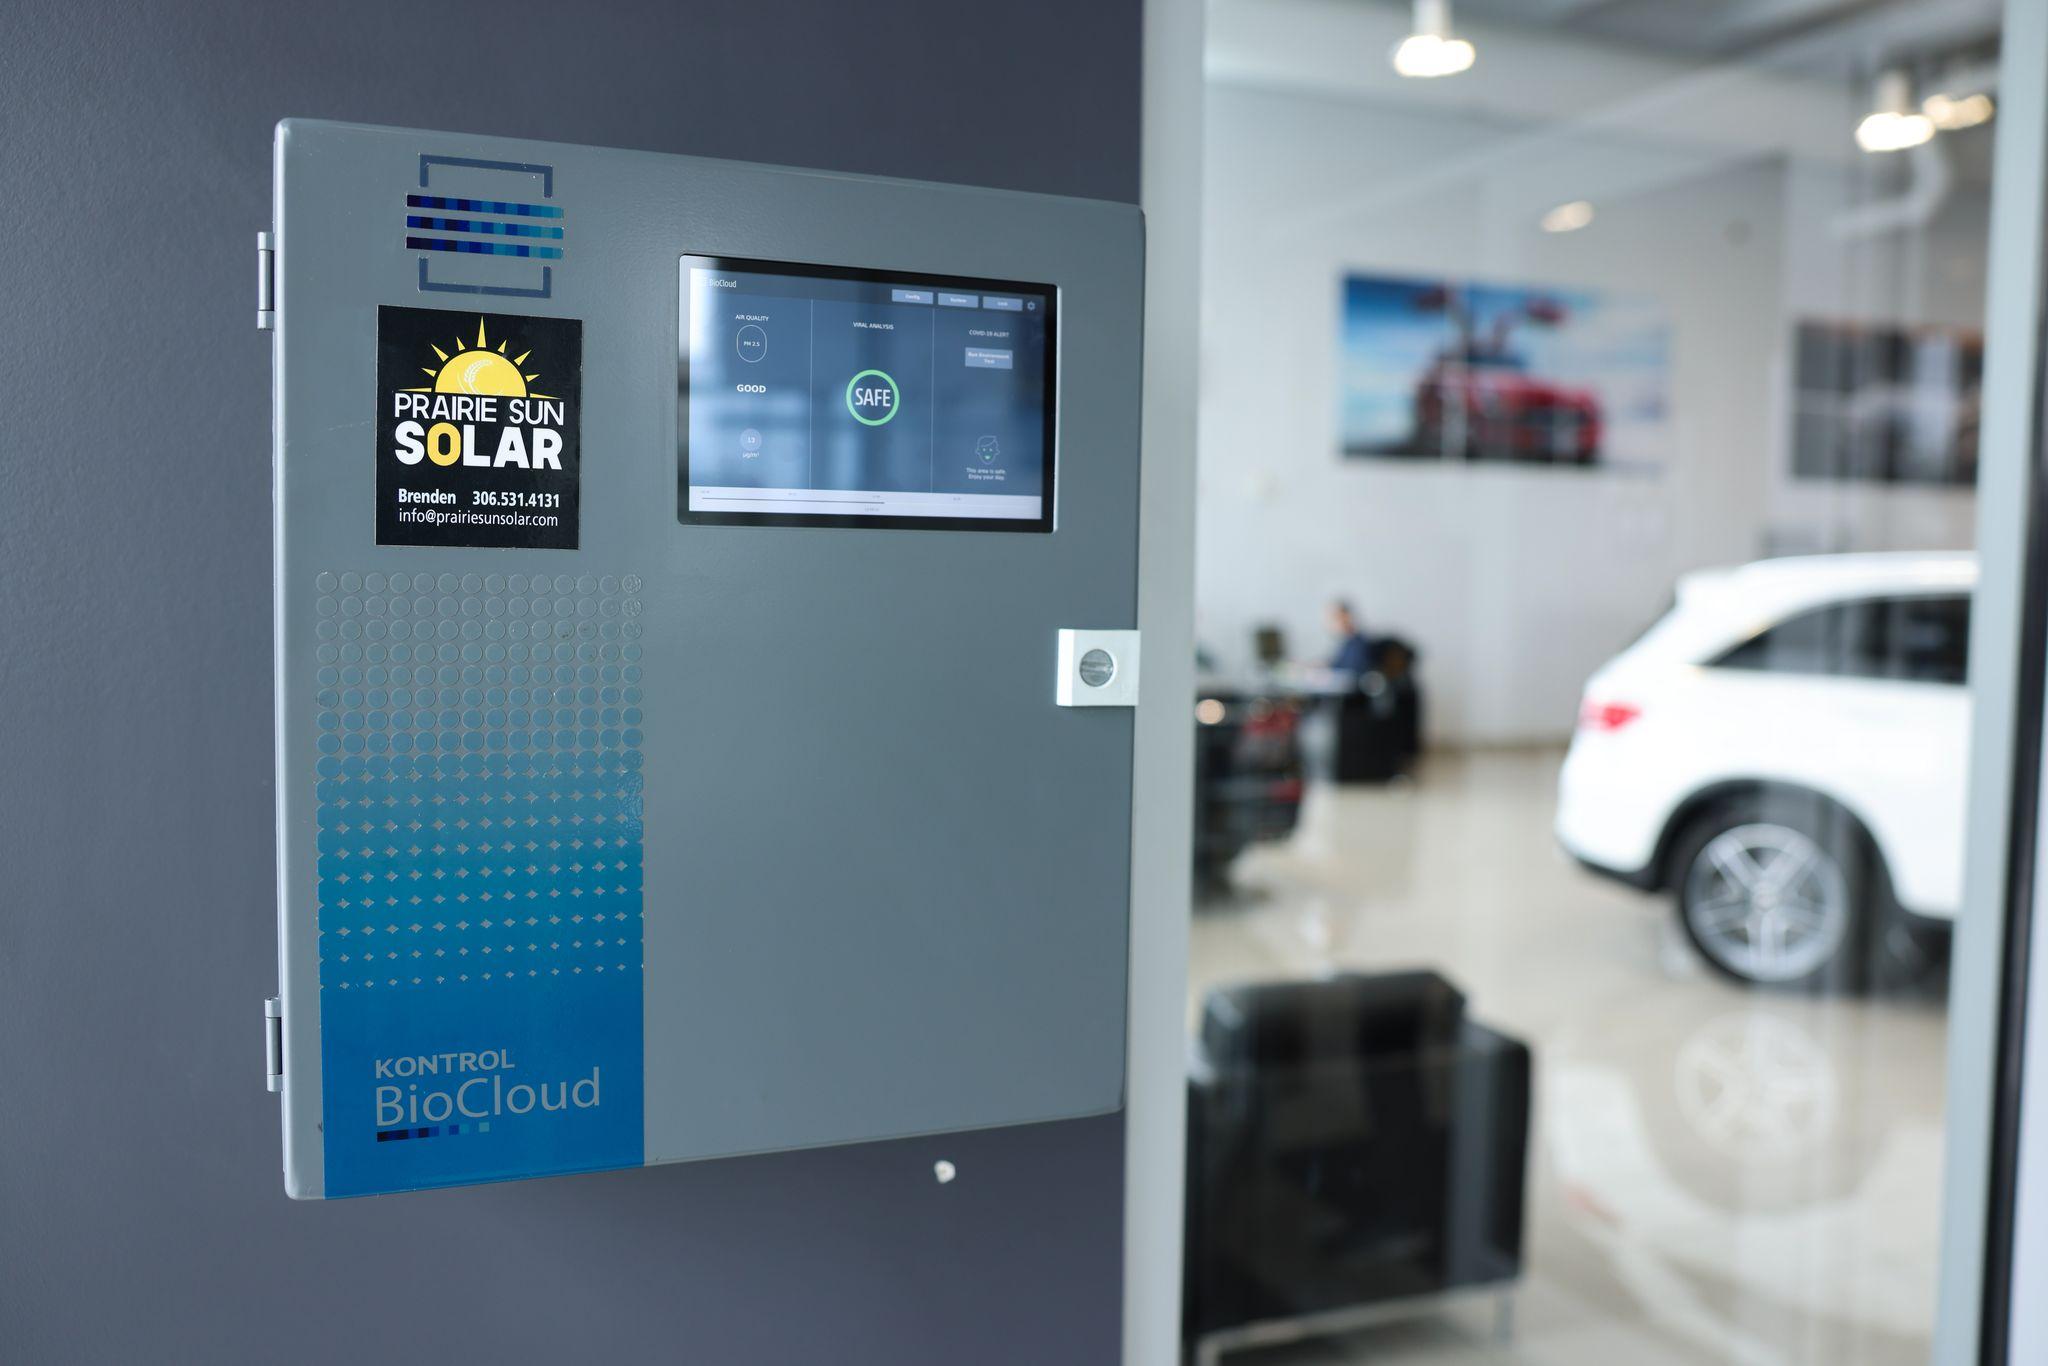 biocloud by kontrol-prairie sun solar